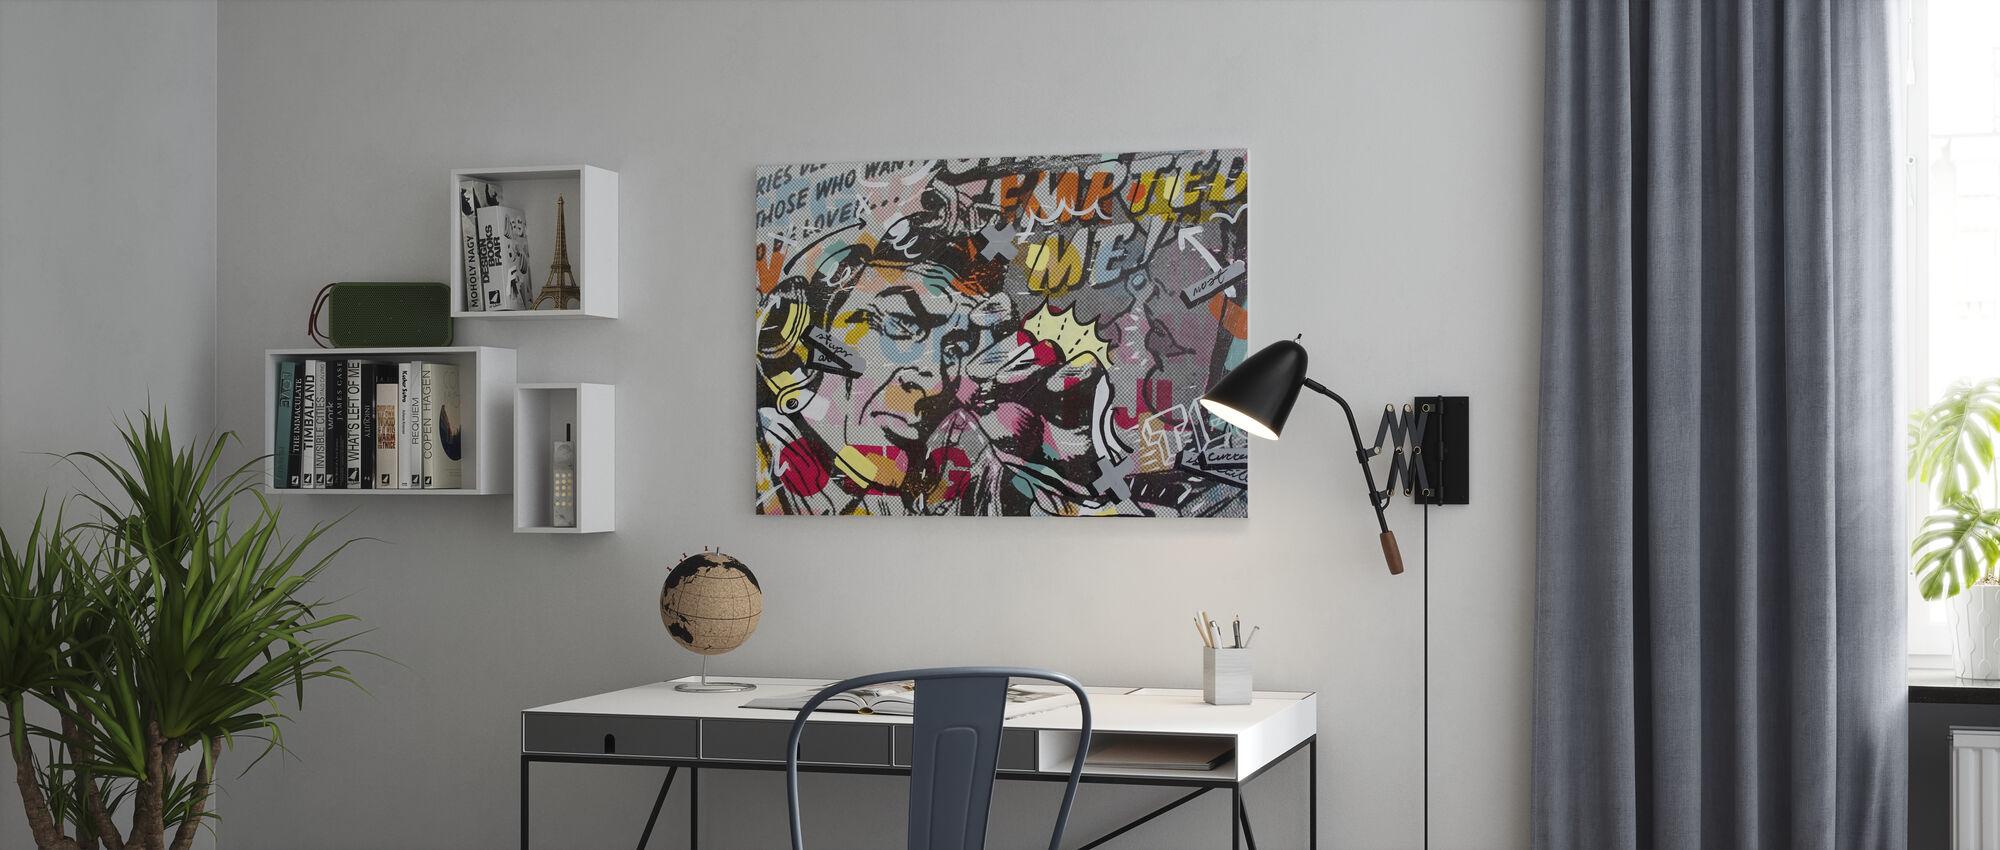 Mimosas - Canvas print - Office